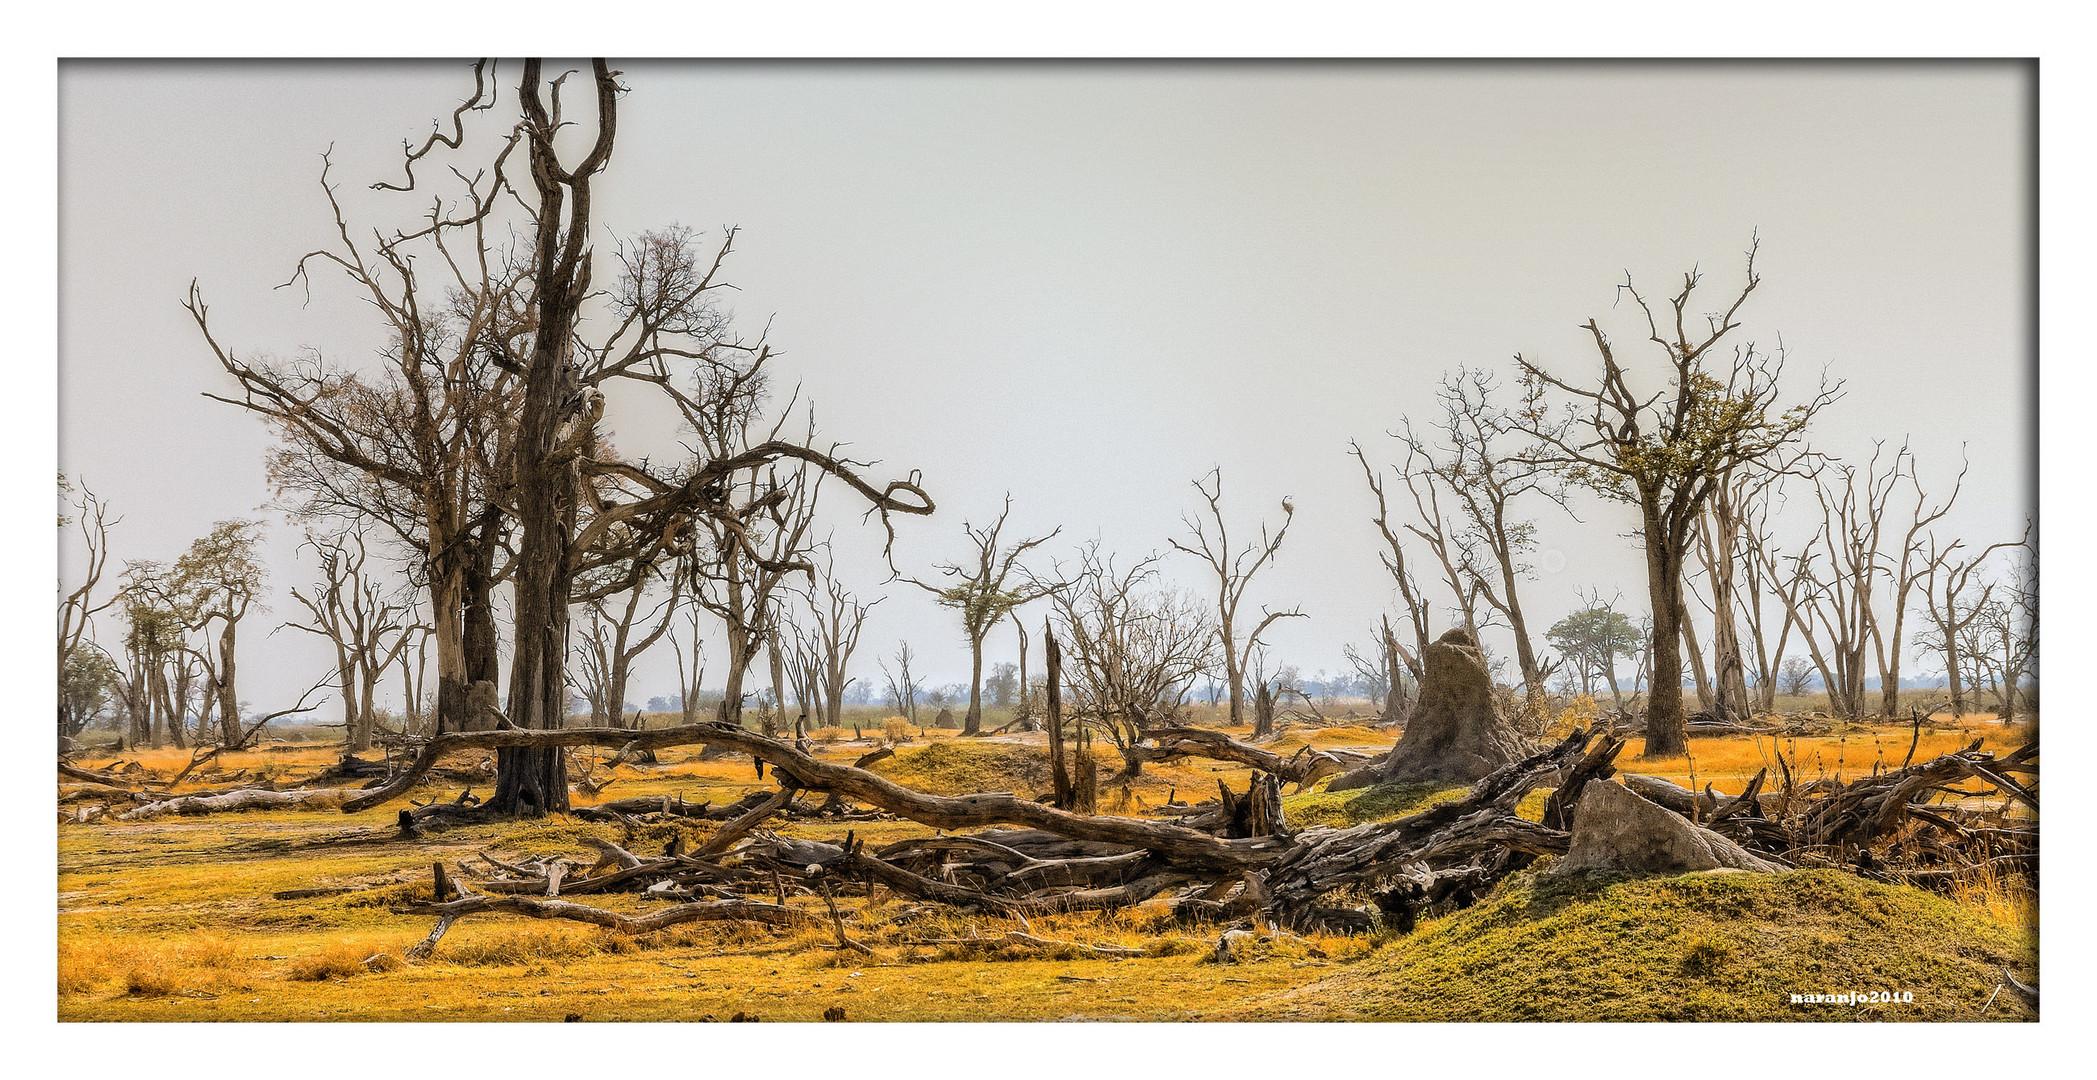 MEMORIAS DE AFRICA-EL BOSQUE PETRIFICADO-2 PN MOREMI -BOSWANA